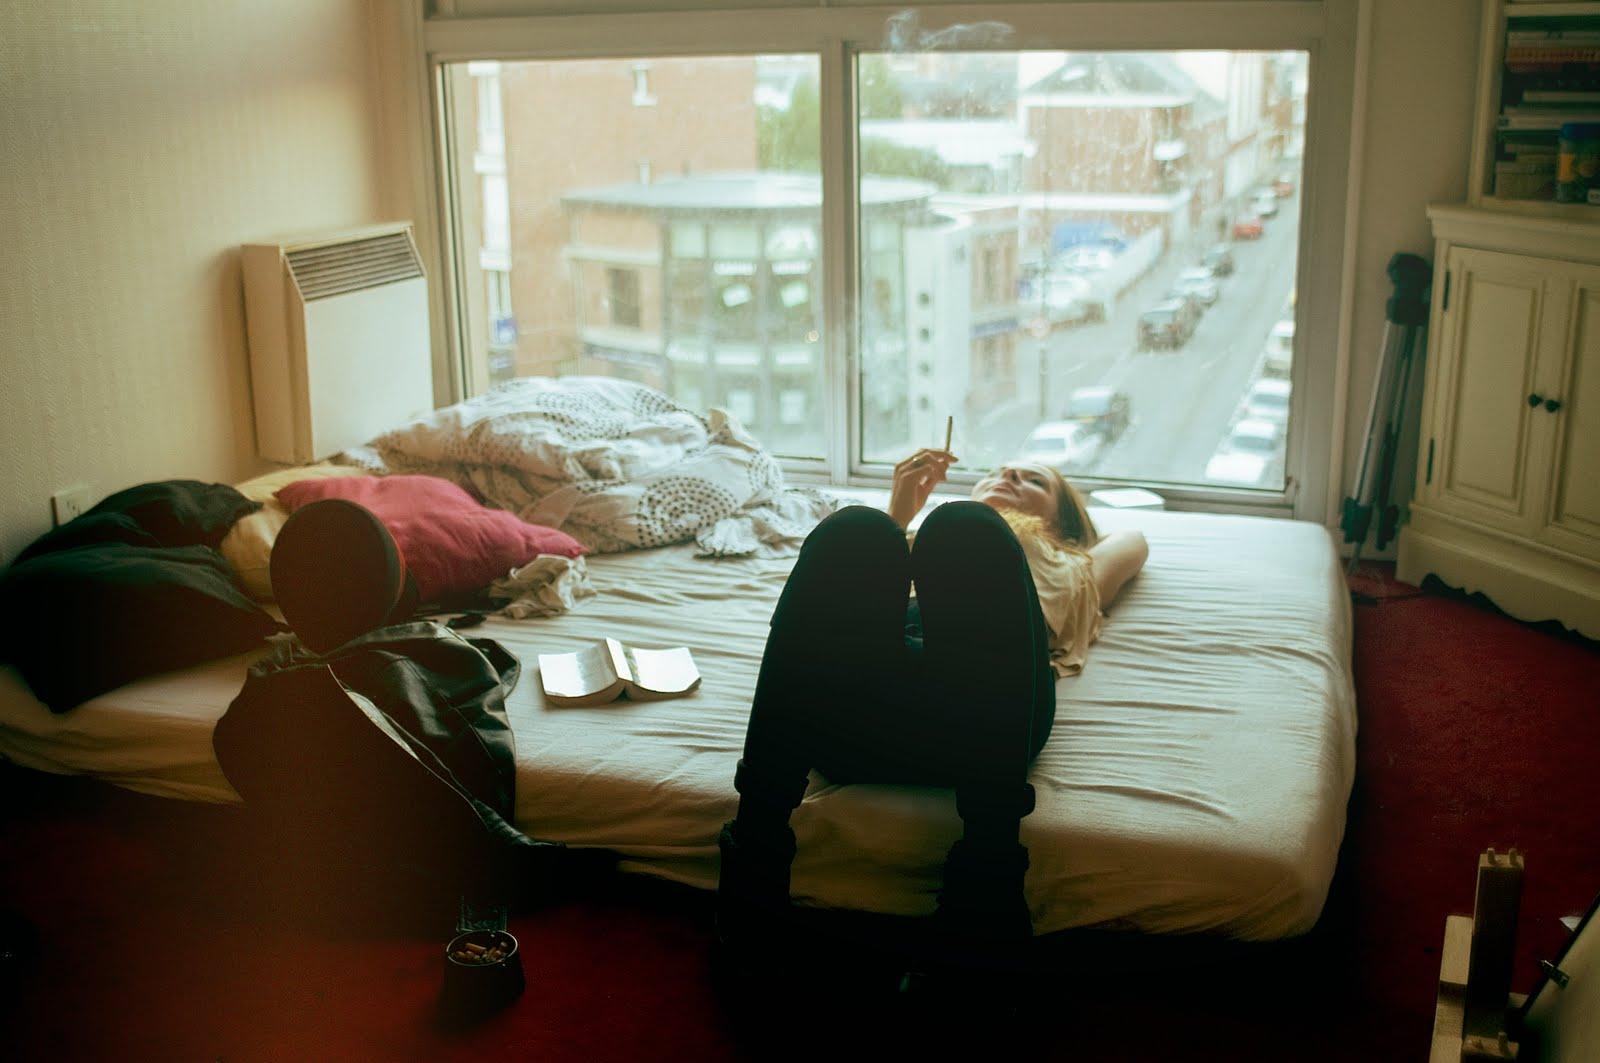 Girls девочки девушки читают книги с котиками на кровати кур.